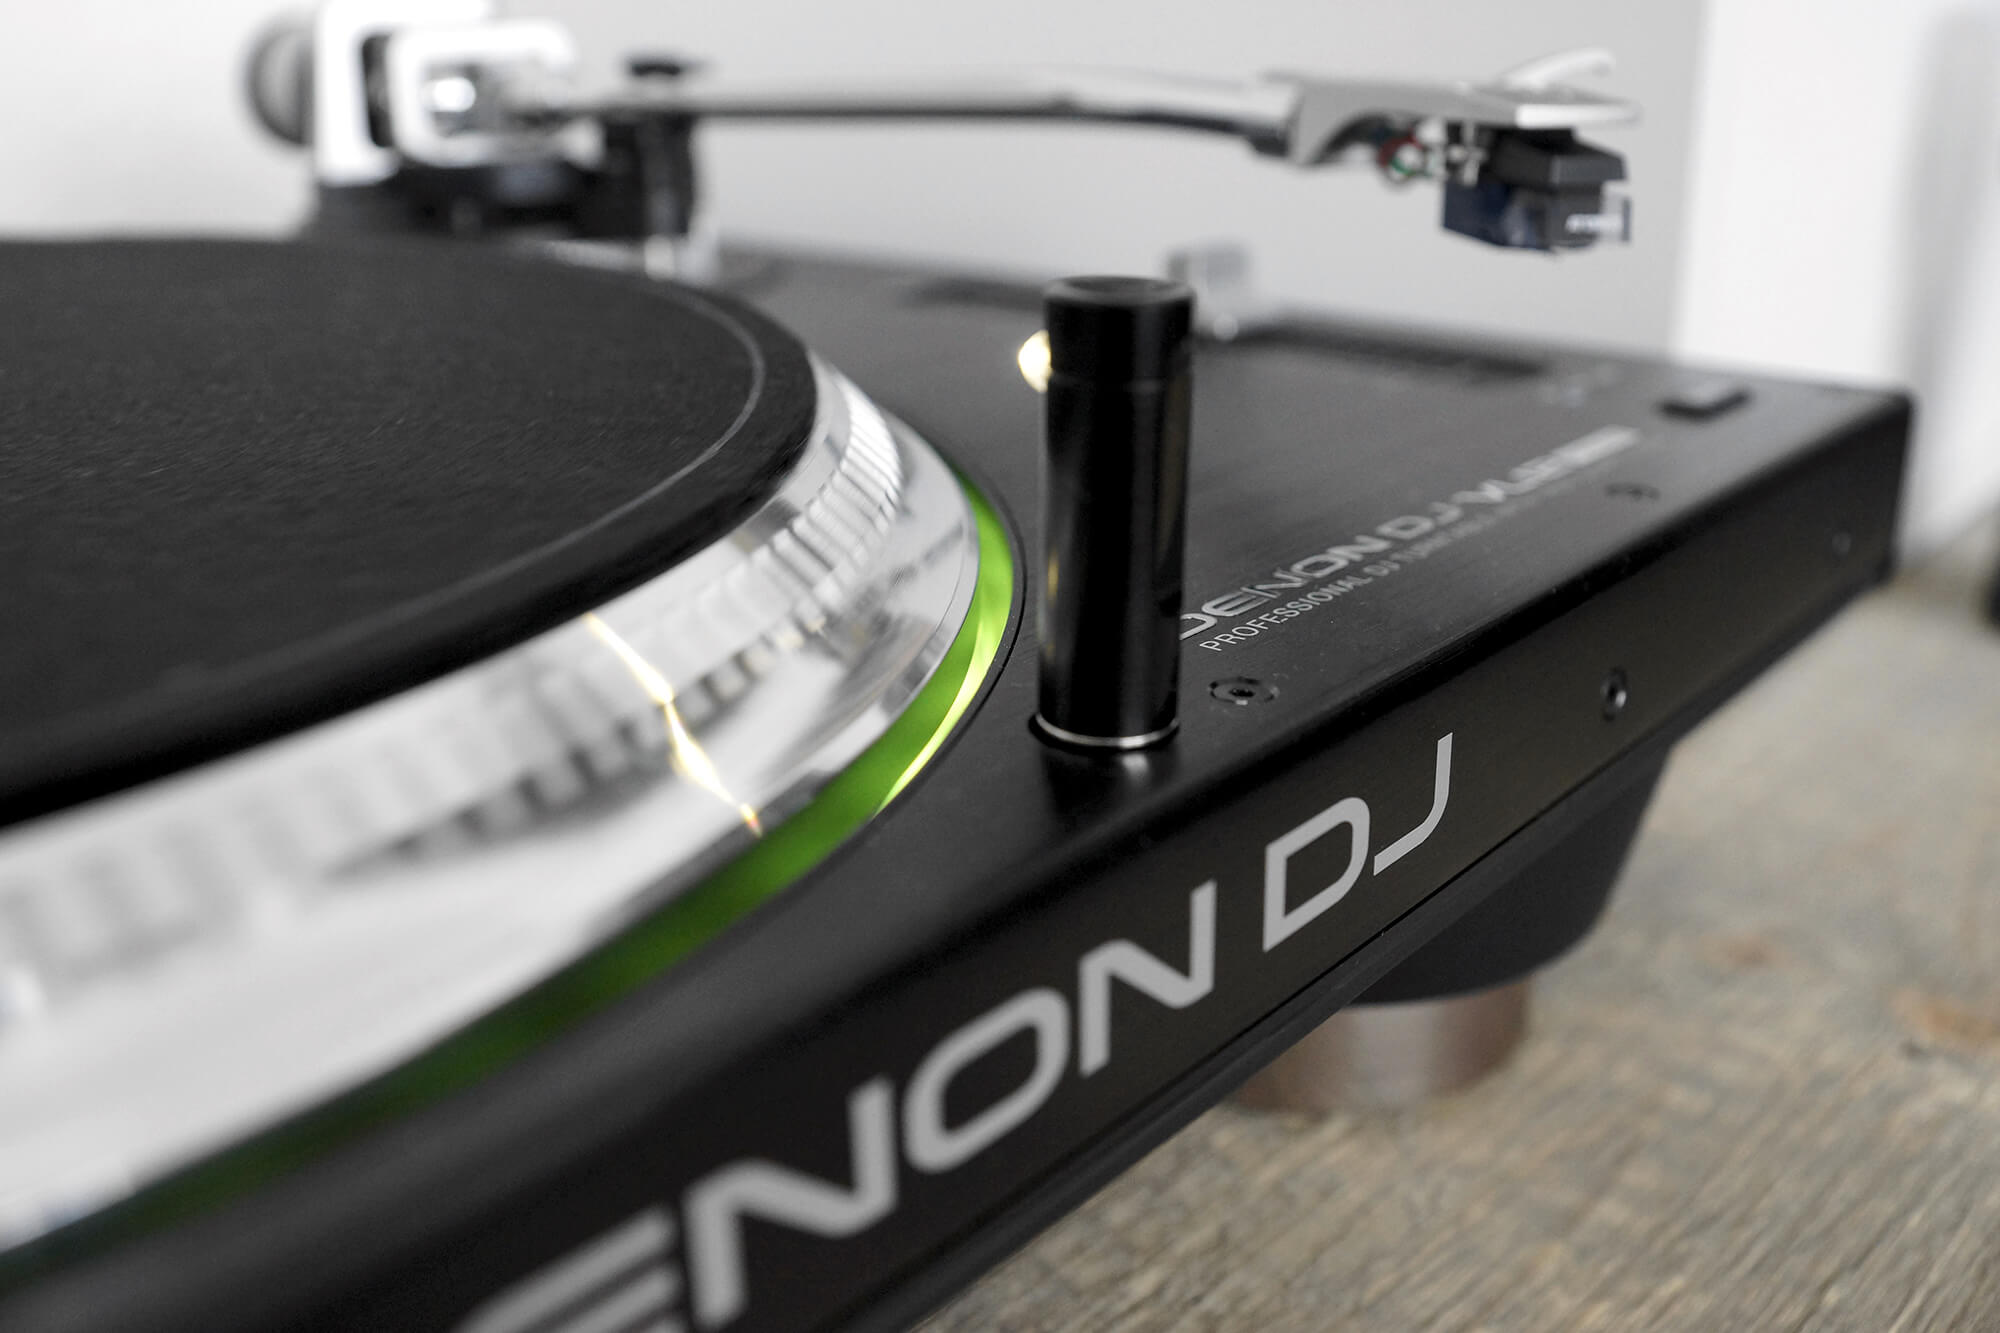 Sonos Vinyl: Denon DJ VL12 Prime Test 12 techboys.de • smarte News, auf den Punkt! Sonos Vinyl: Denon DJ VL12 Prime Test